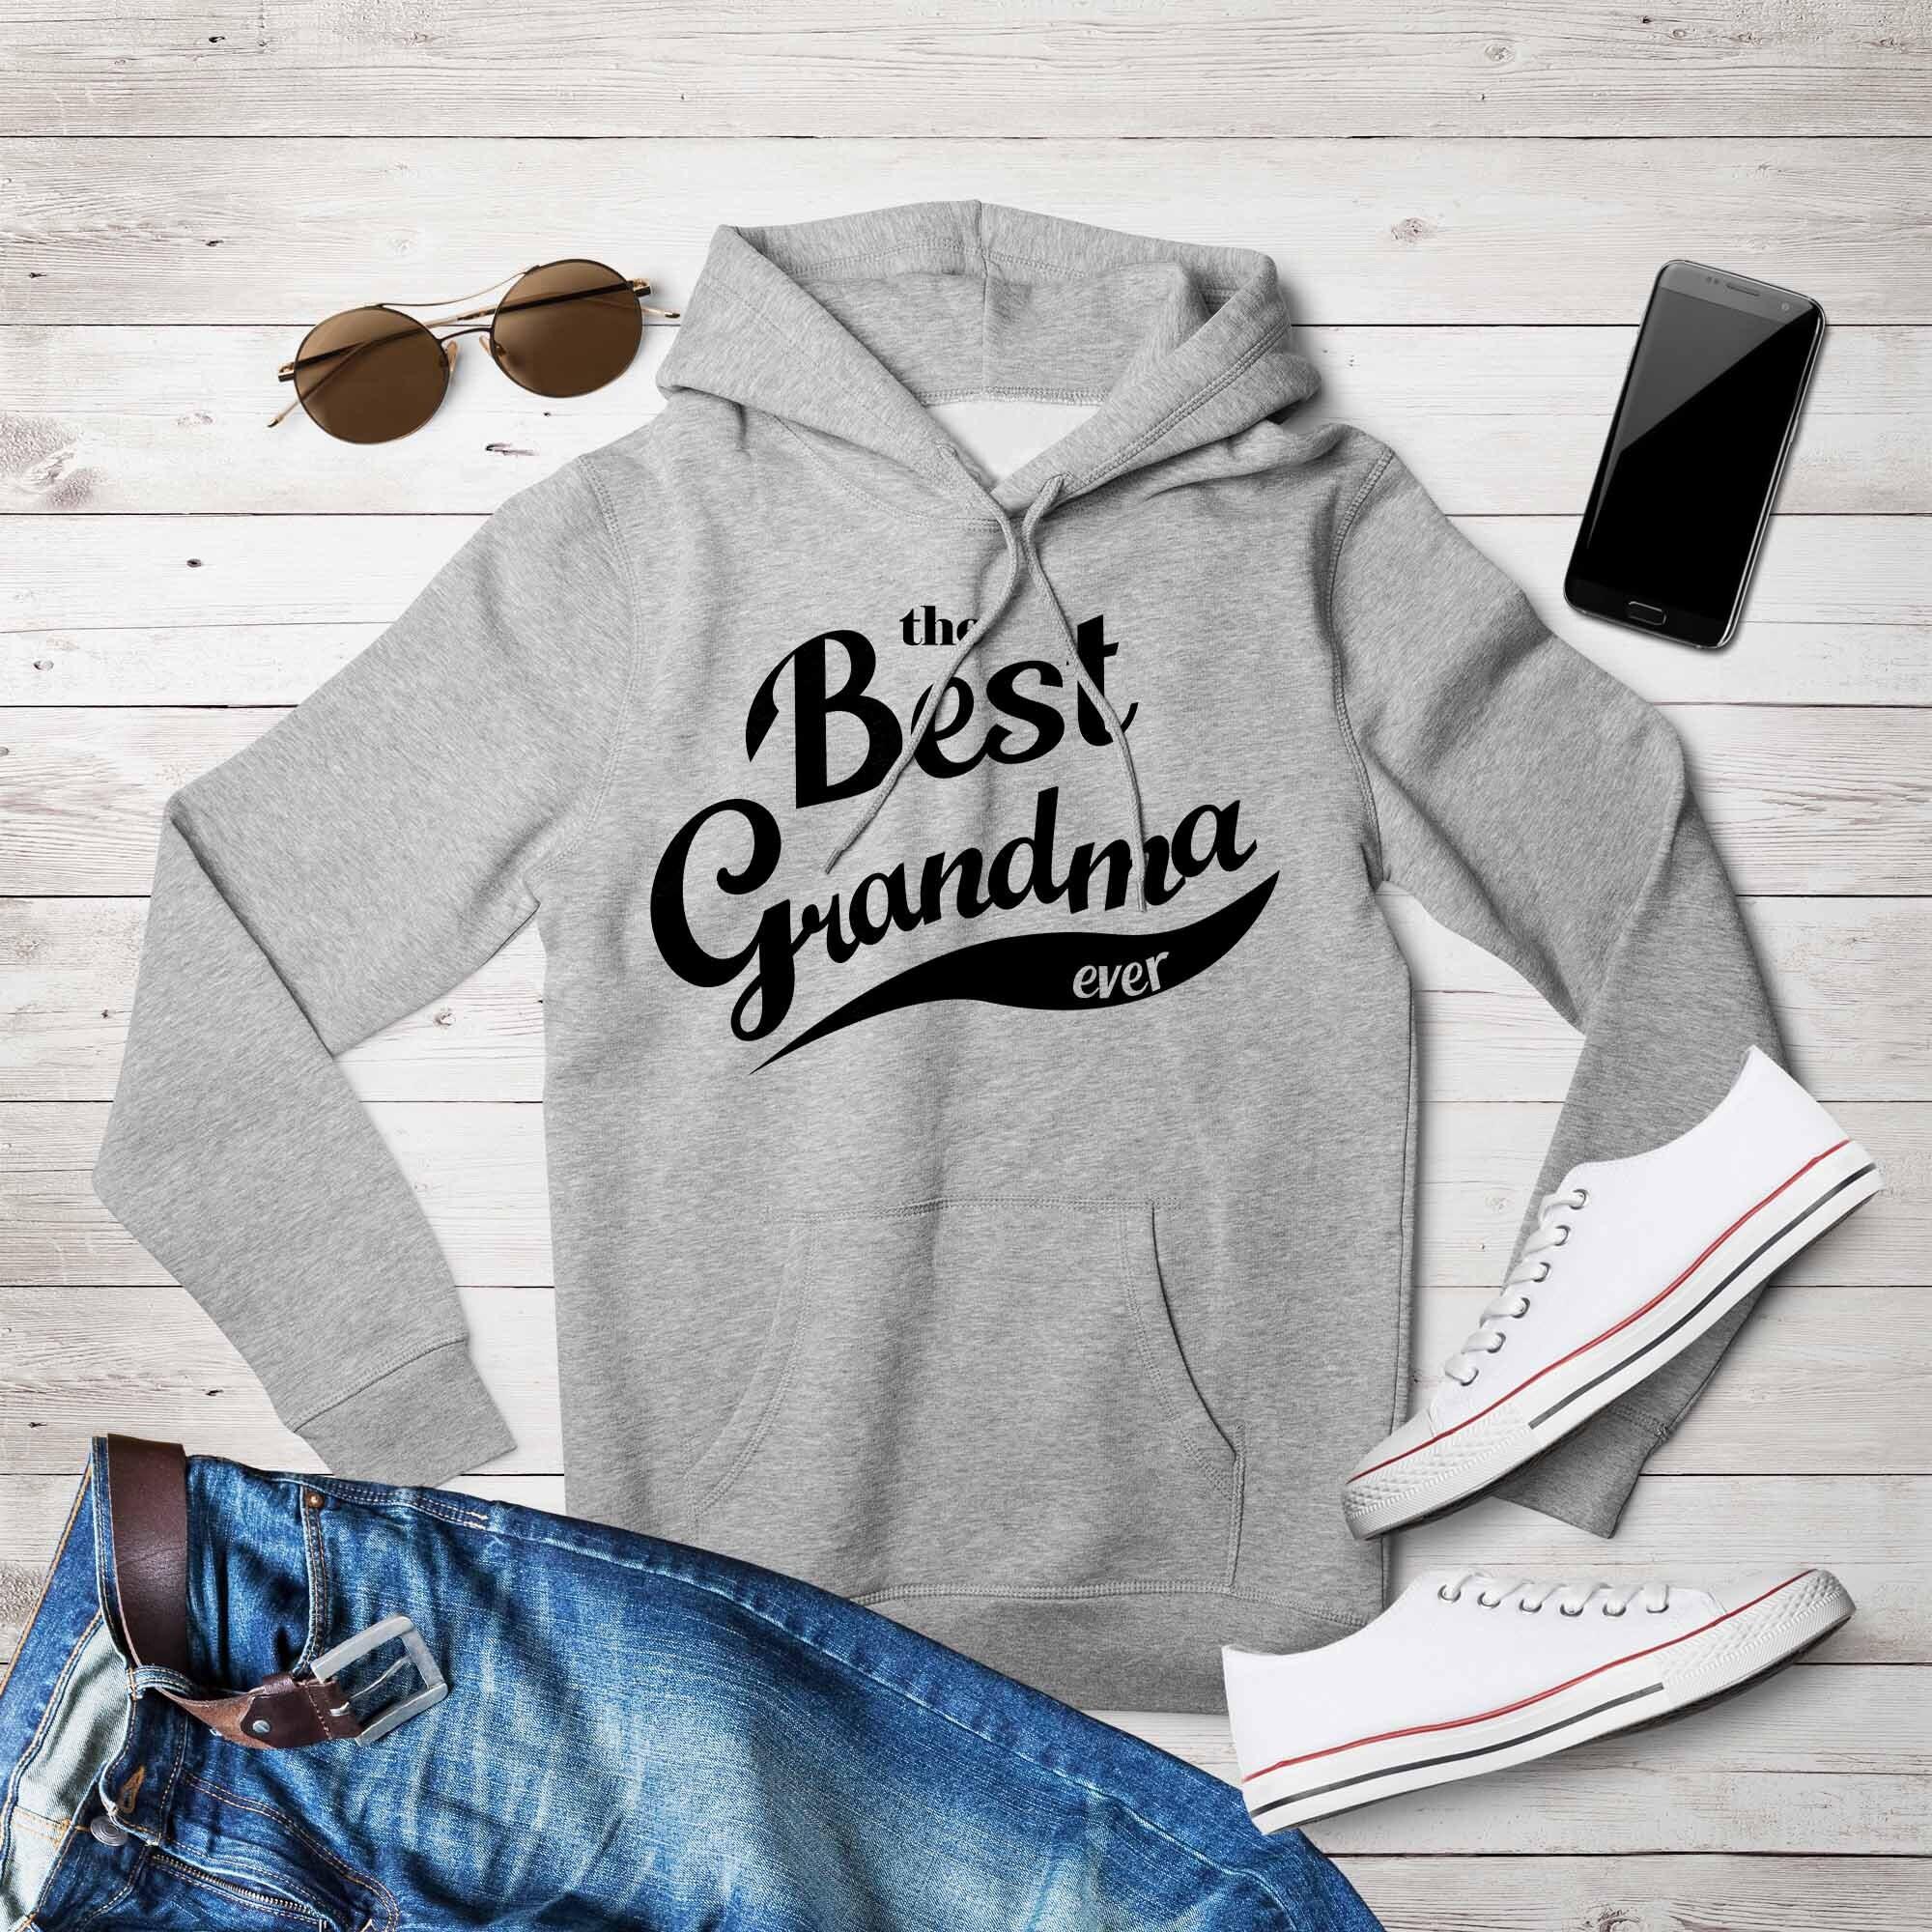 best grandma ever Hoodies Mothers Nana Gifts, Mothers Hoodies Day Gifts, Christmas, grandmother Hoodies, personalized Hoodies, pregnant,newborn baby, 35da11